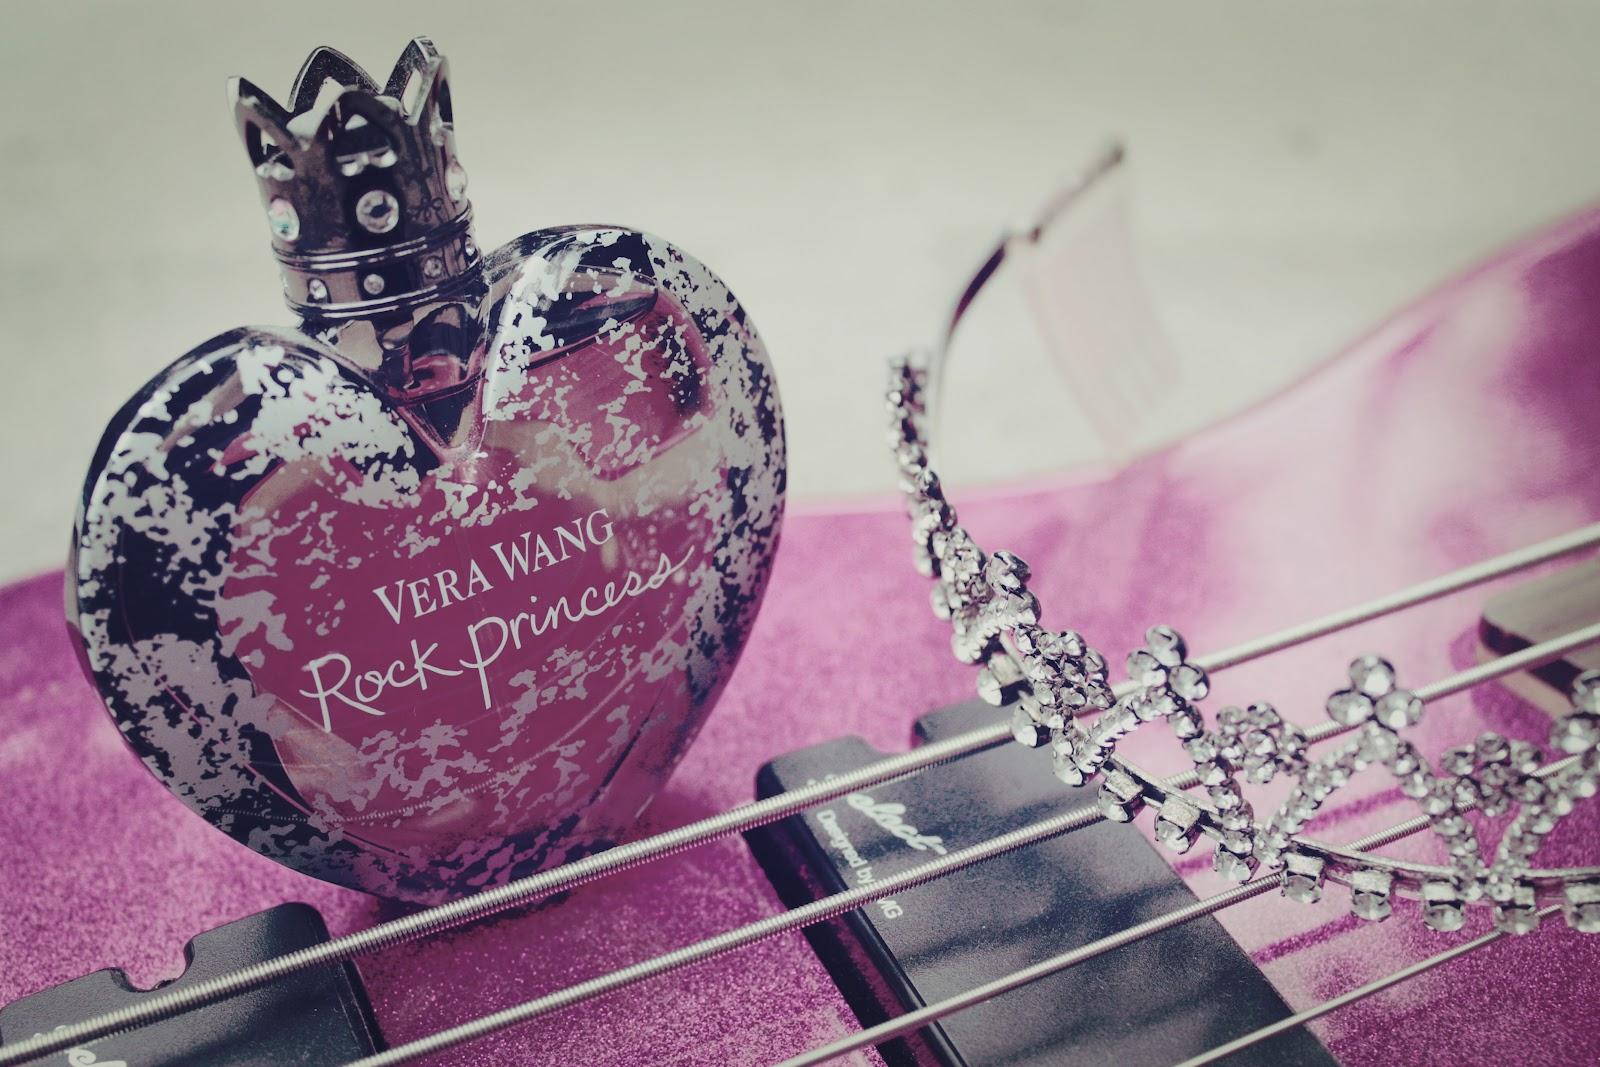 http://4.bp.blogspot.com/-_V9YorQftek/T-hpJag7mXI/AAAAAAAASkw/FxLWcDVXXx4/s1600/Rock-Princess.jpg